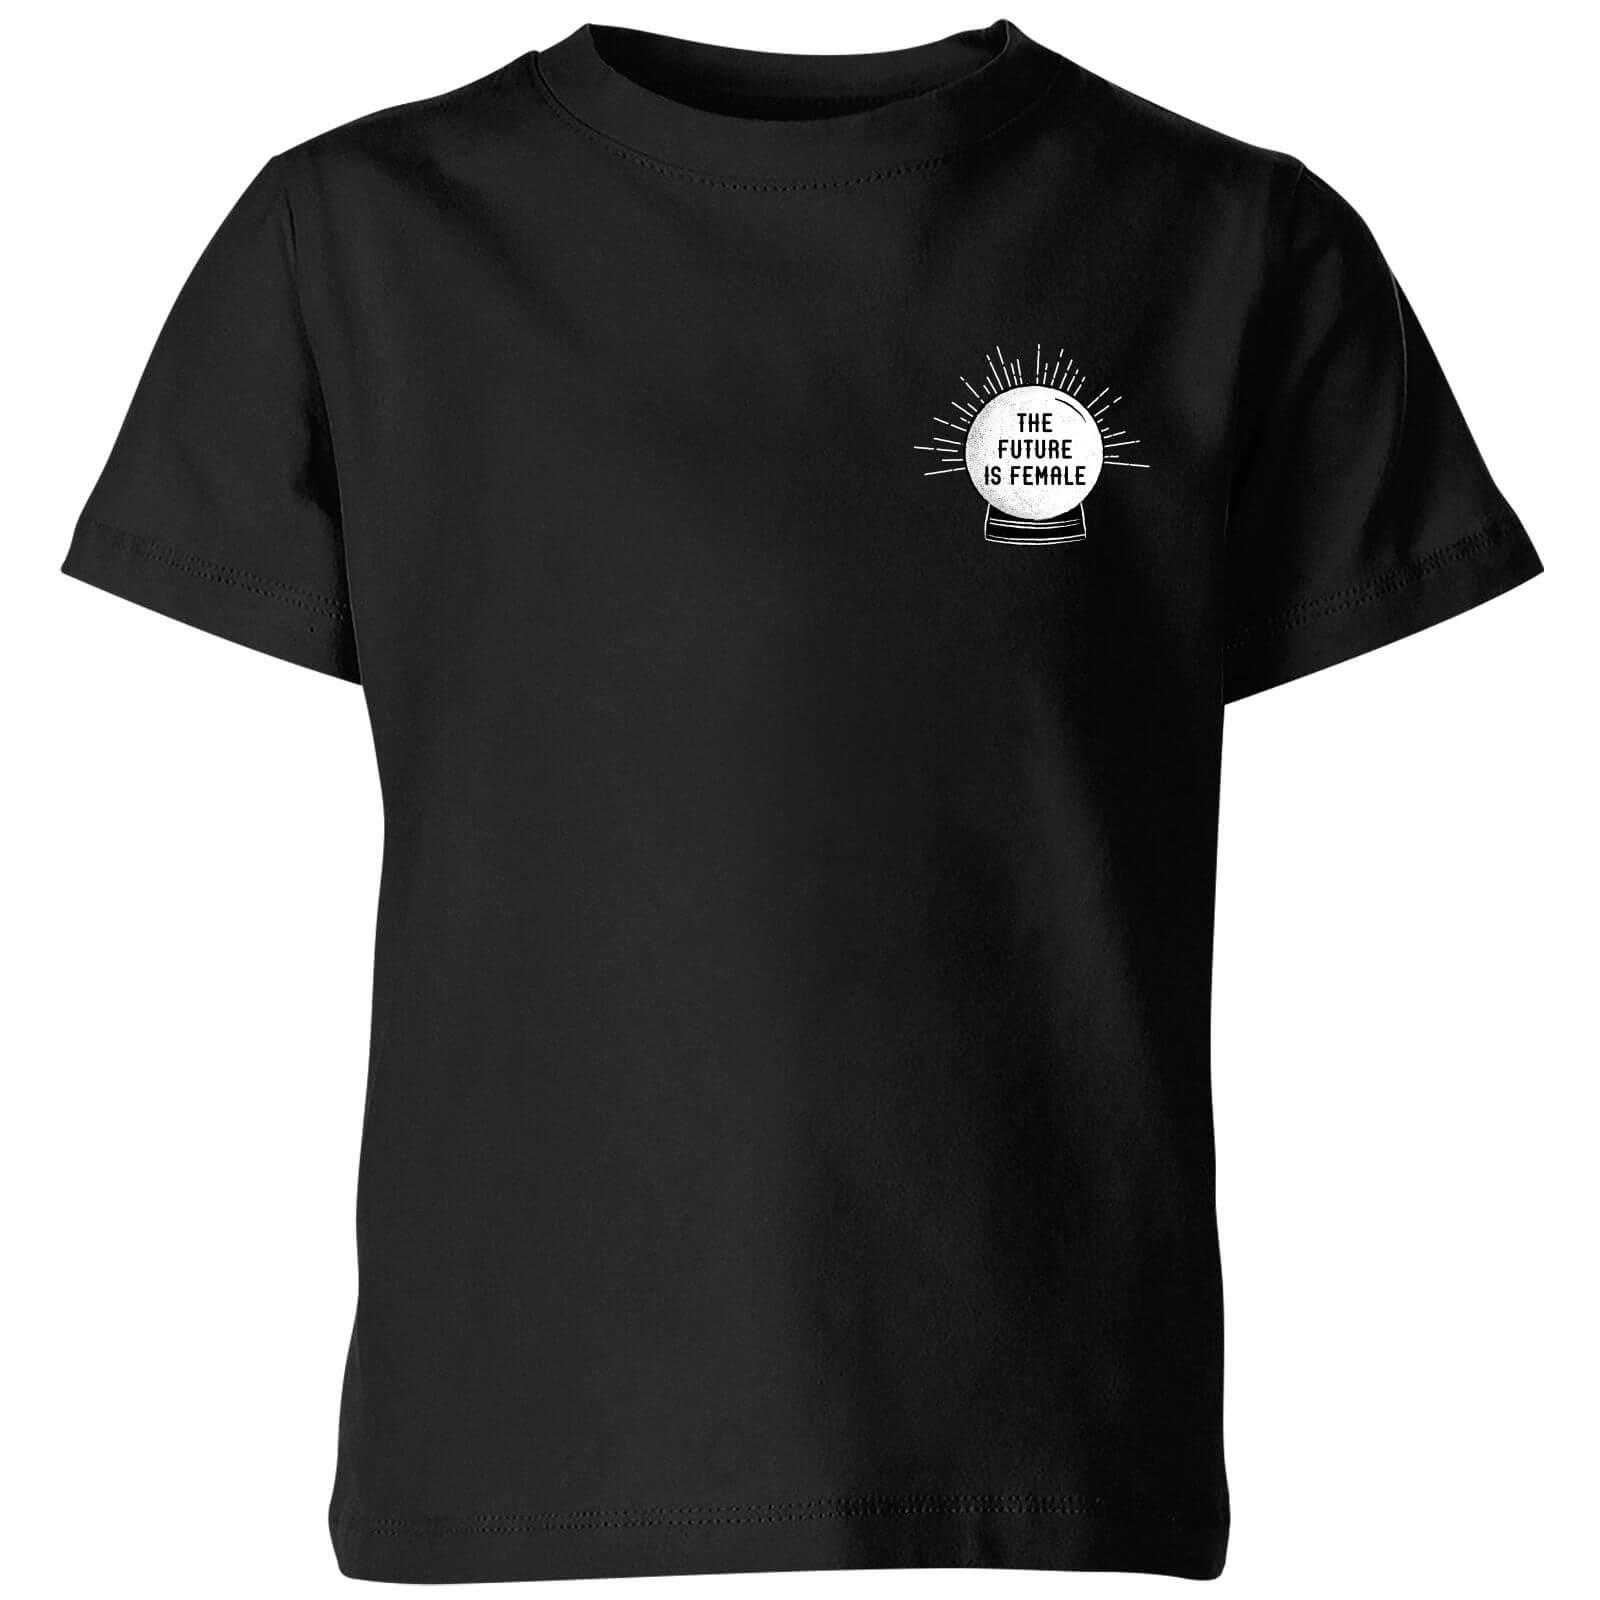 The Future Is Female Kids' T-Shirt - Black - 11-12 Years - Black